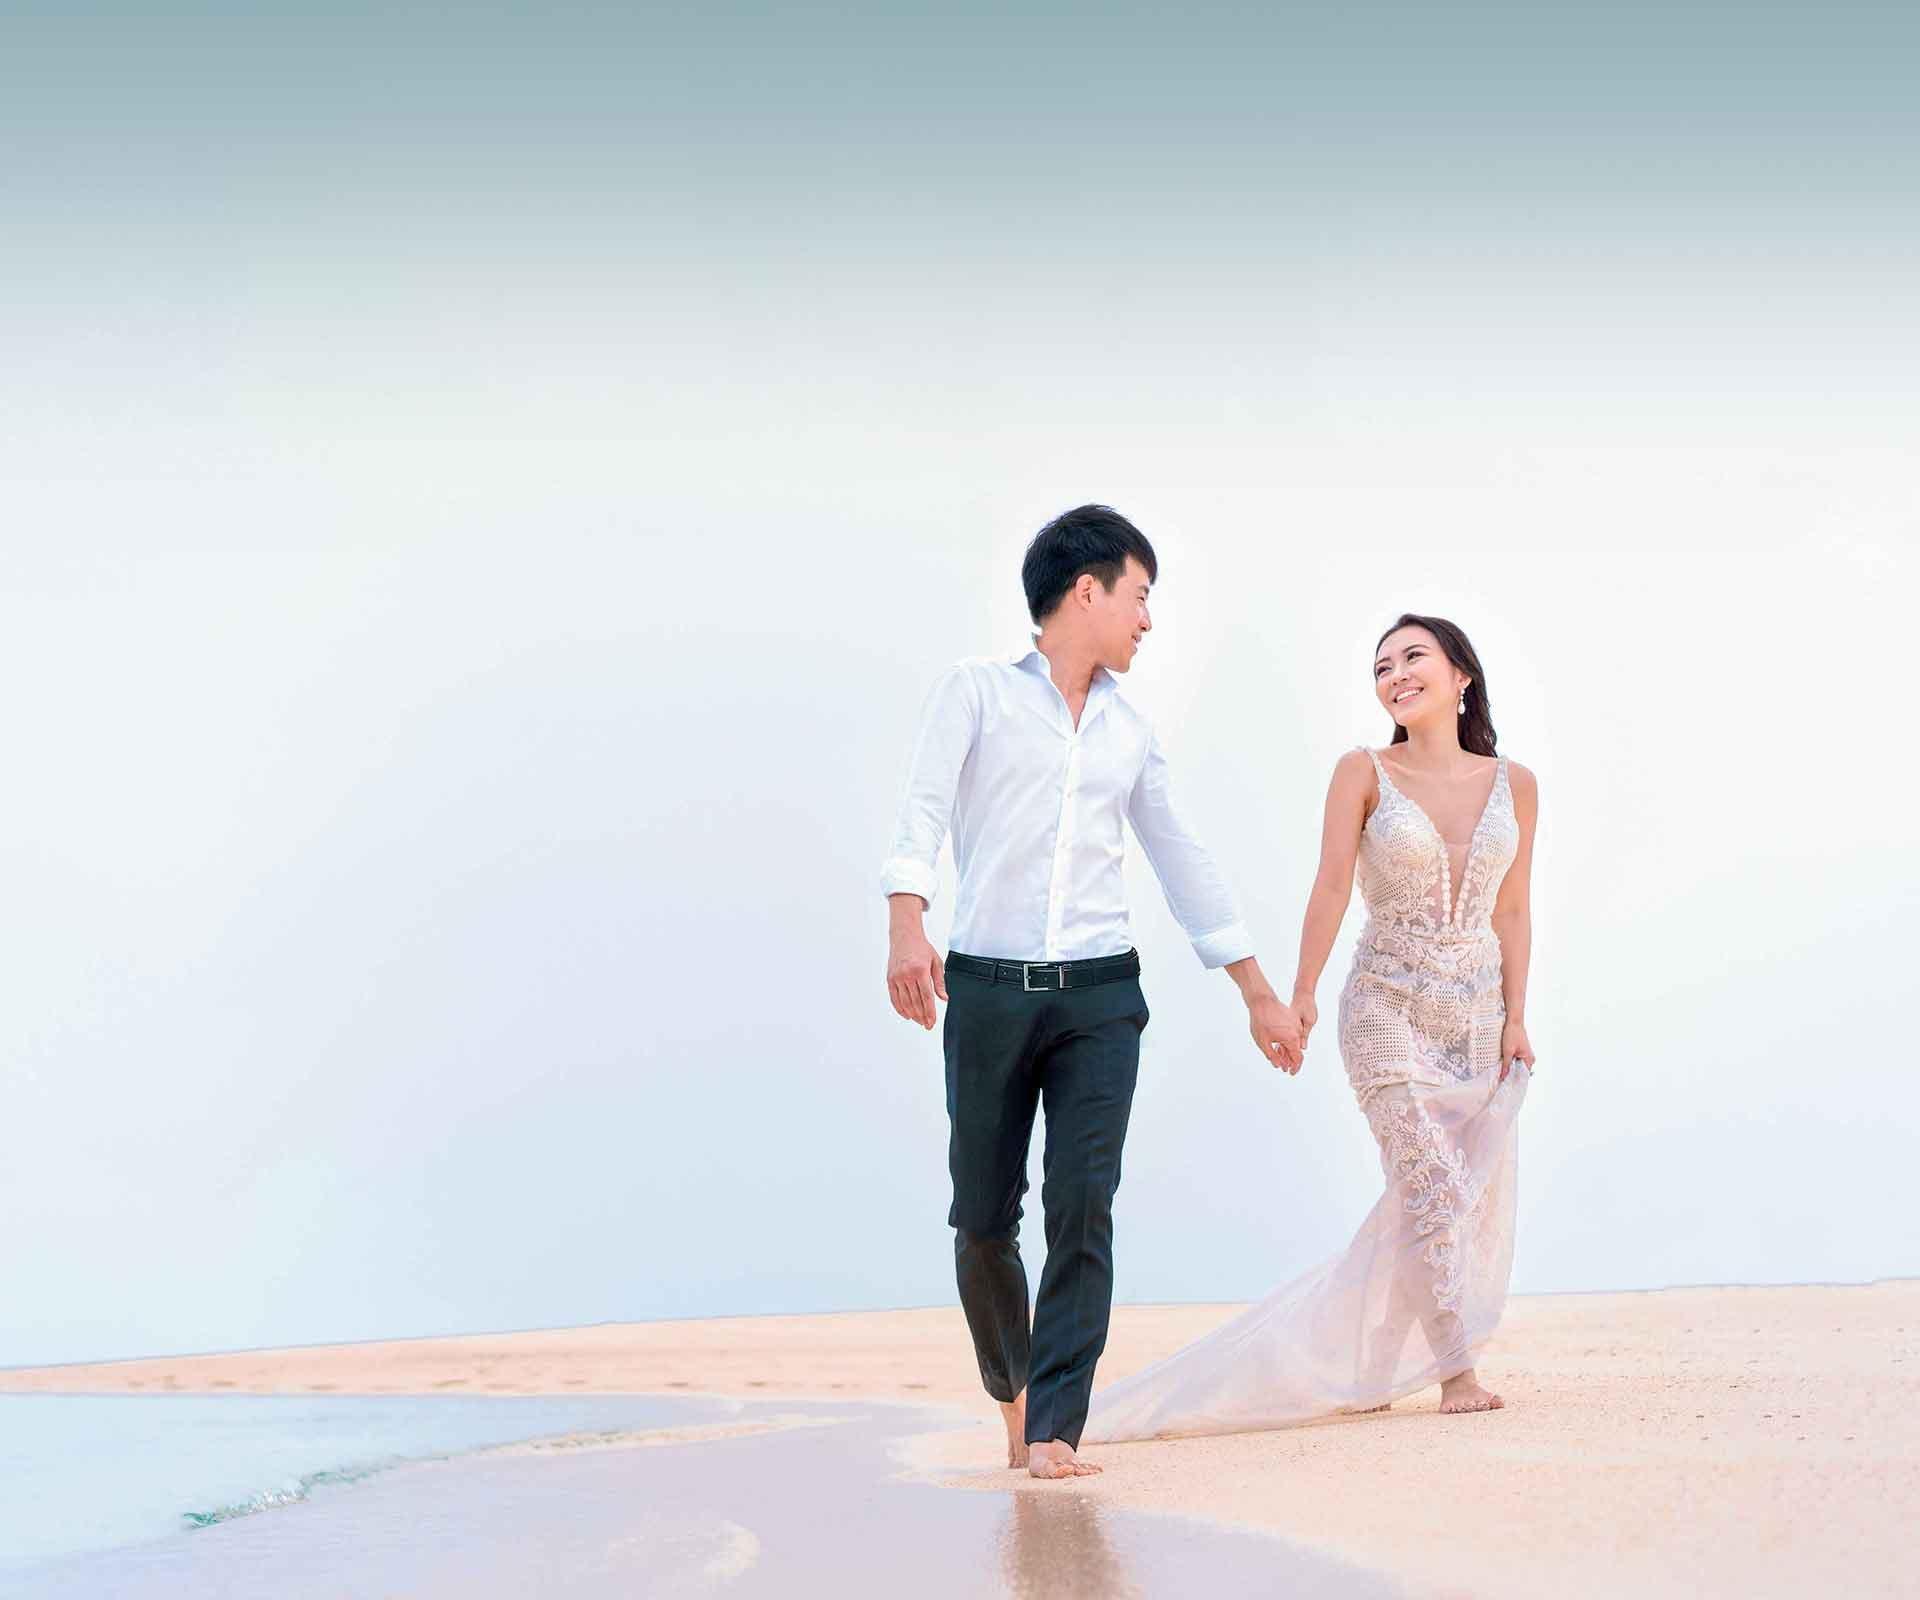 gradient_male_female_wedding_couple_walking_along_beach_pink_hour-3